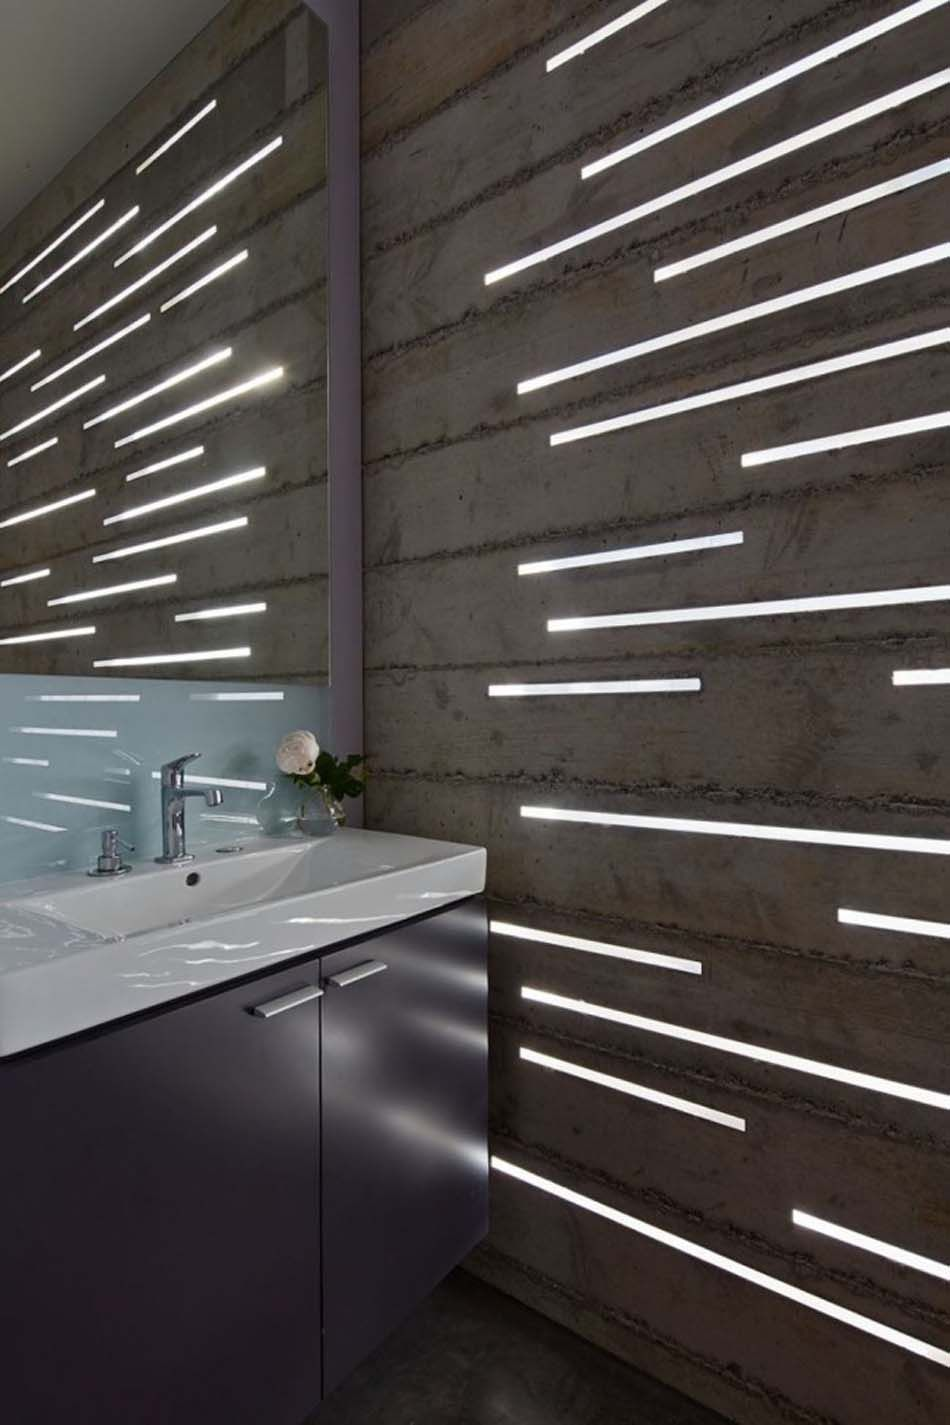 personnaliser sa salle de bain design avec un look extravagant ou cr atif. Black Bedroom Furniture Sets. Home Design Ideas